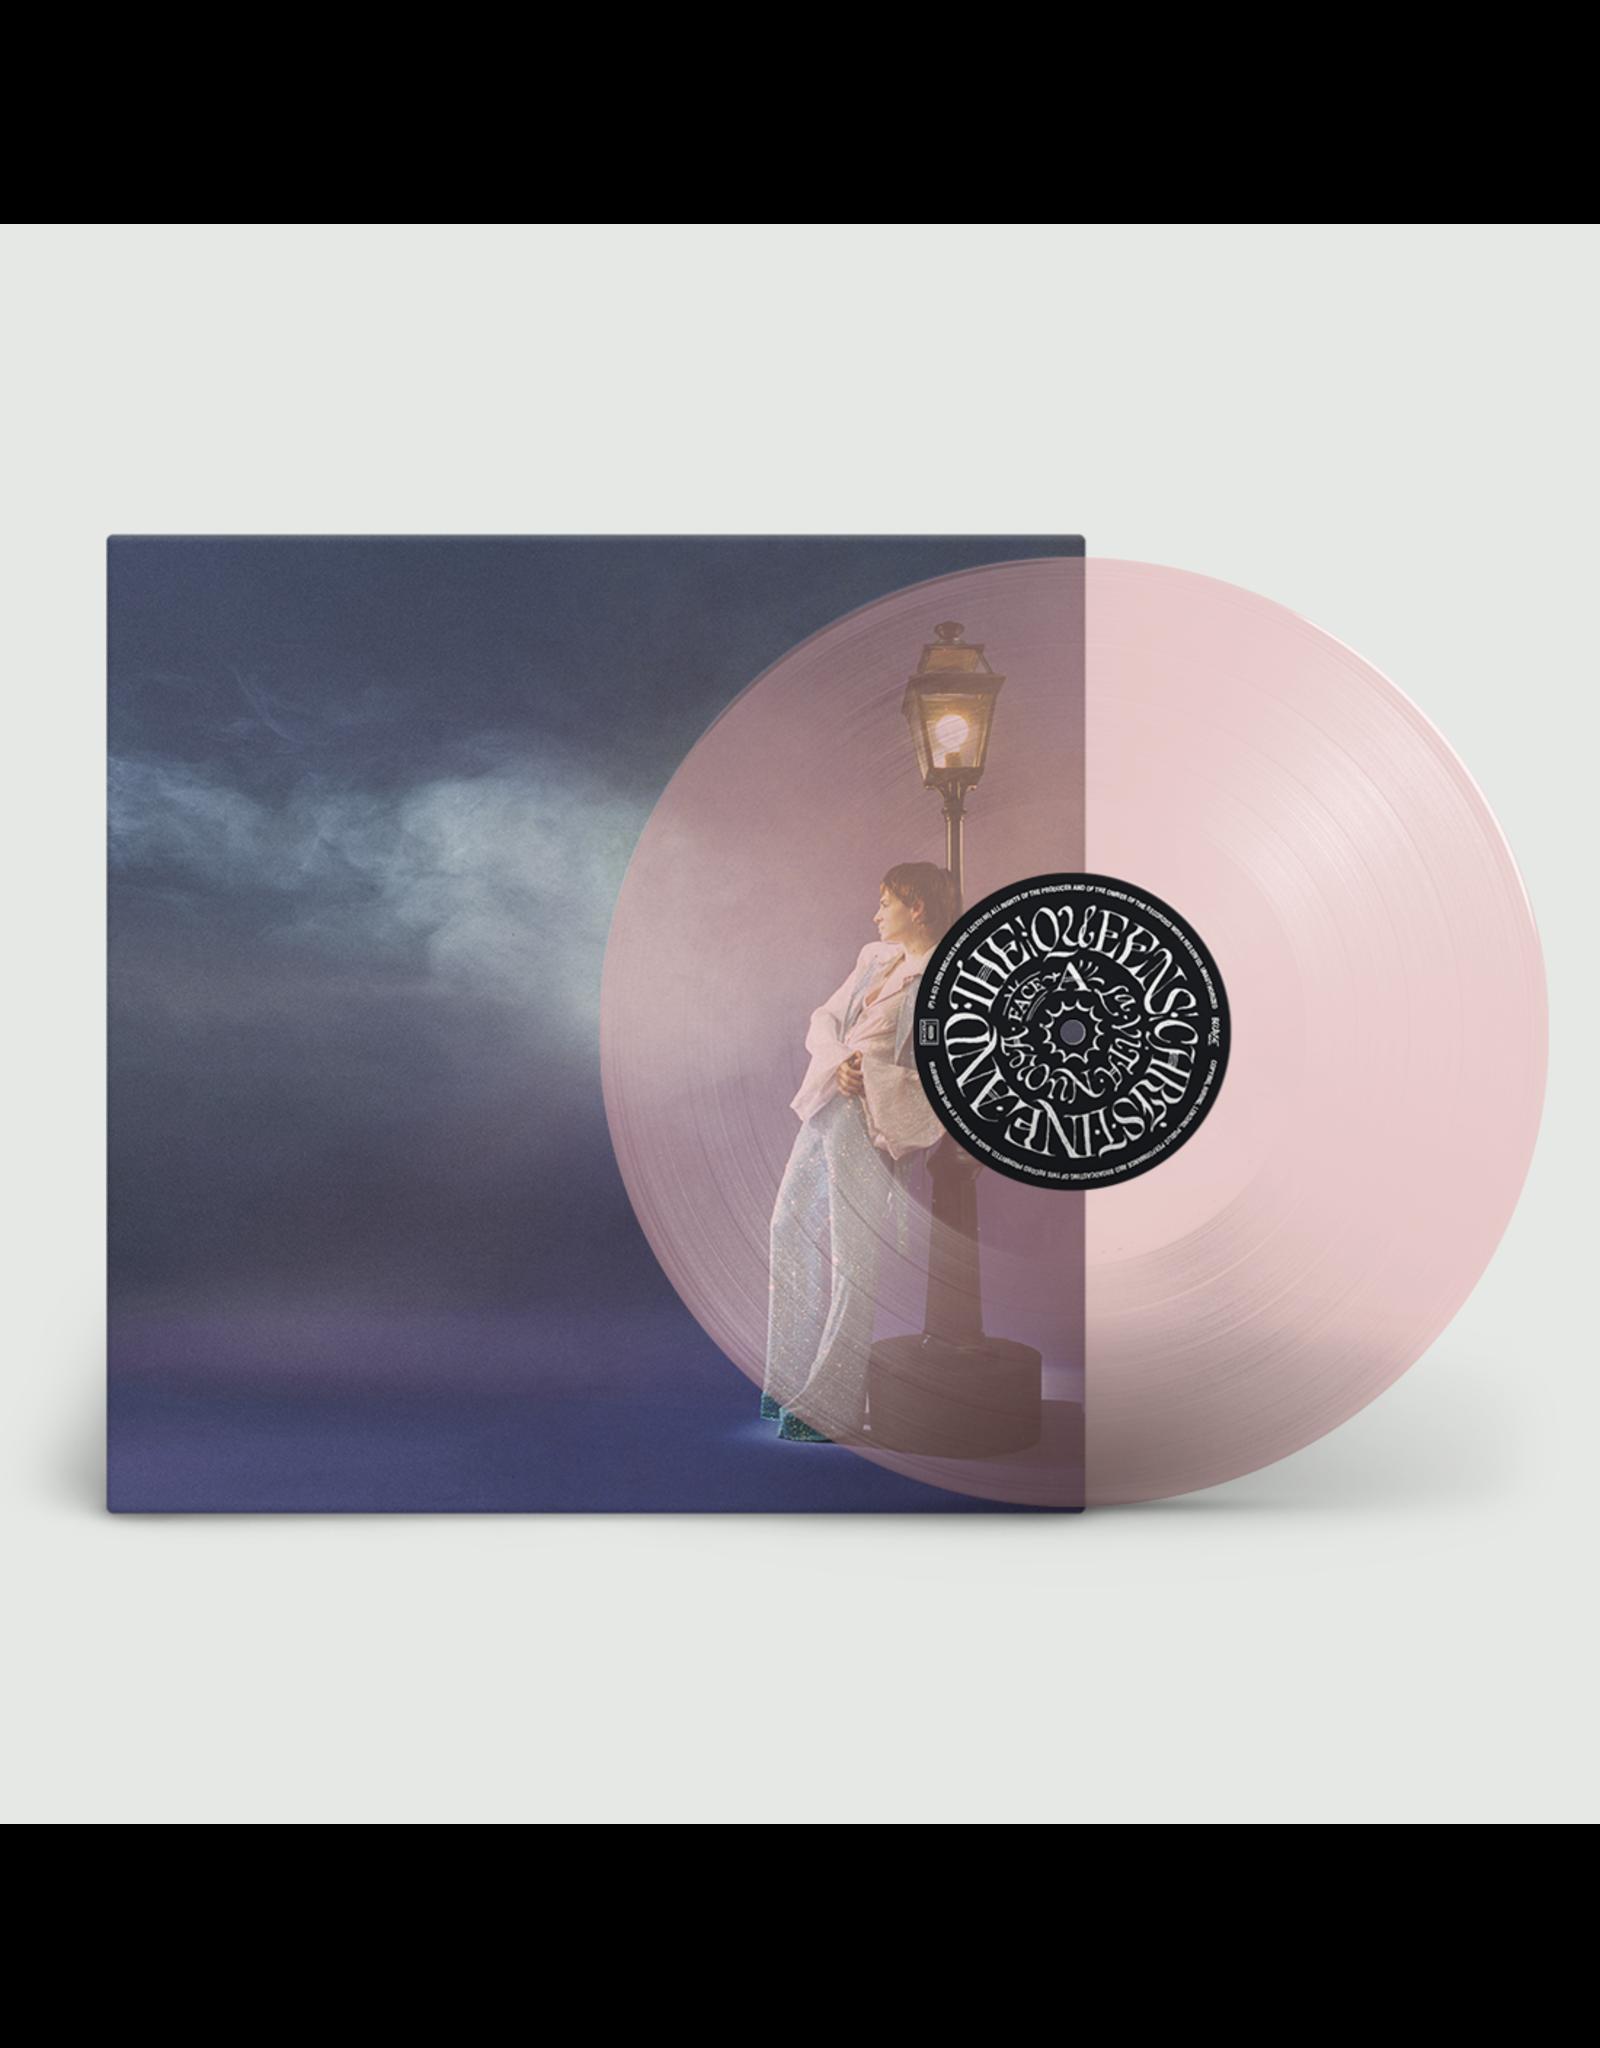 Christine & The Queens - La Vita Nuova (Pink Vinyl)